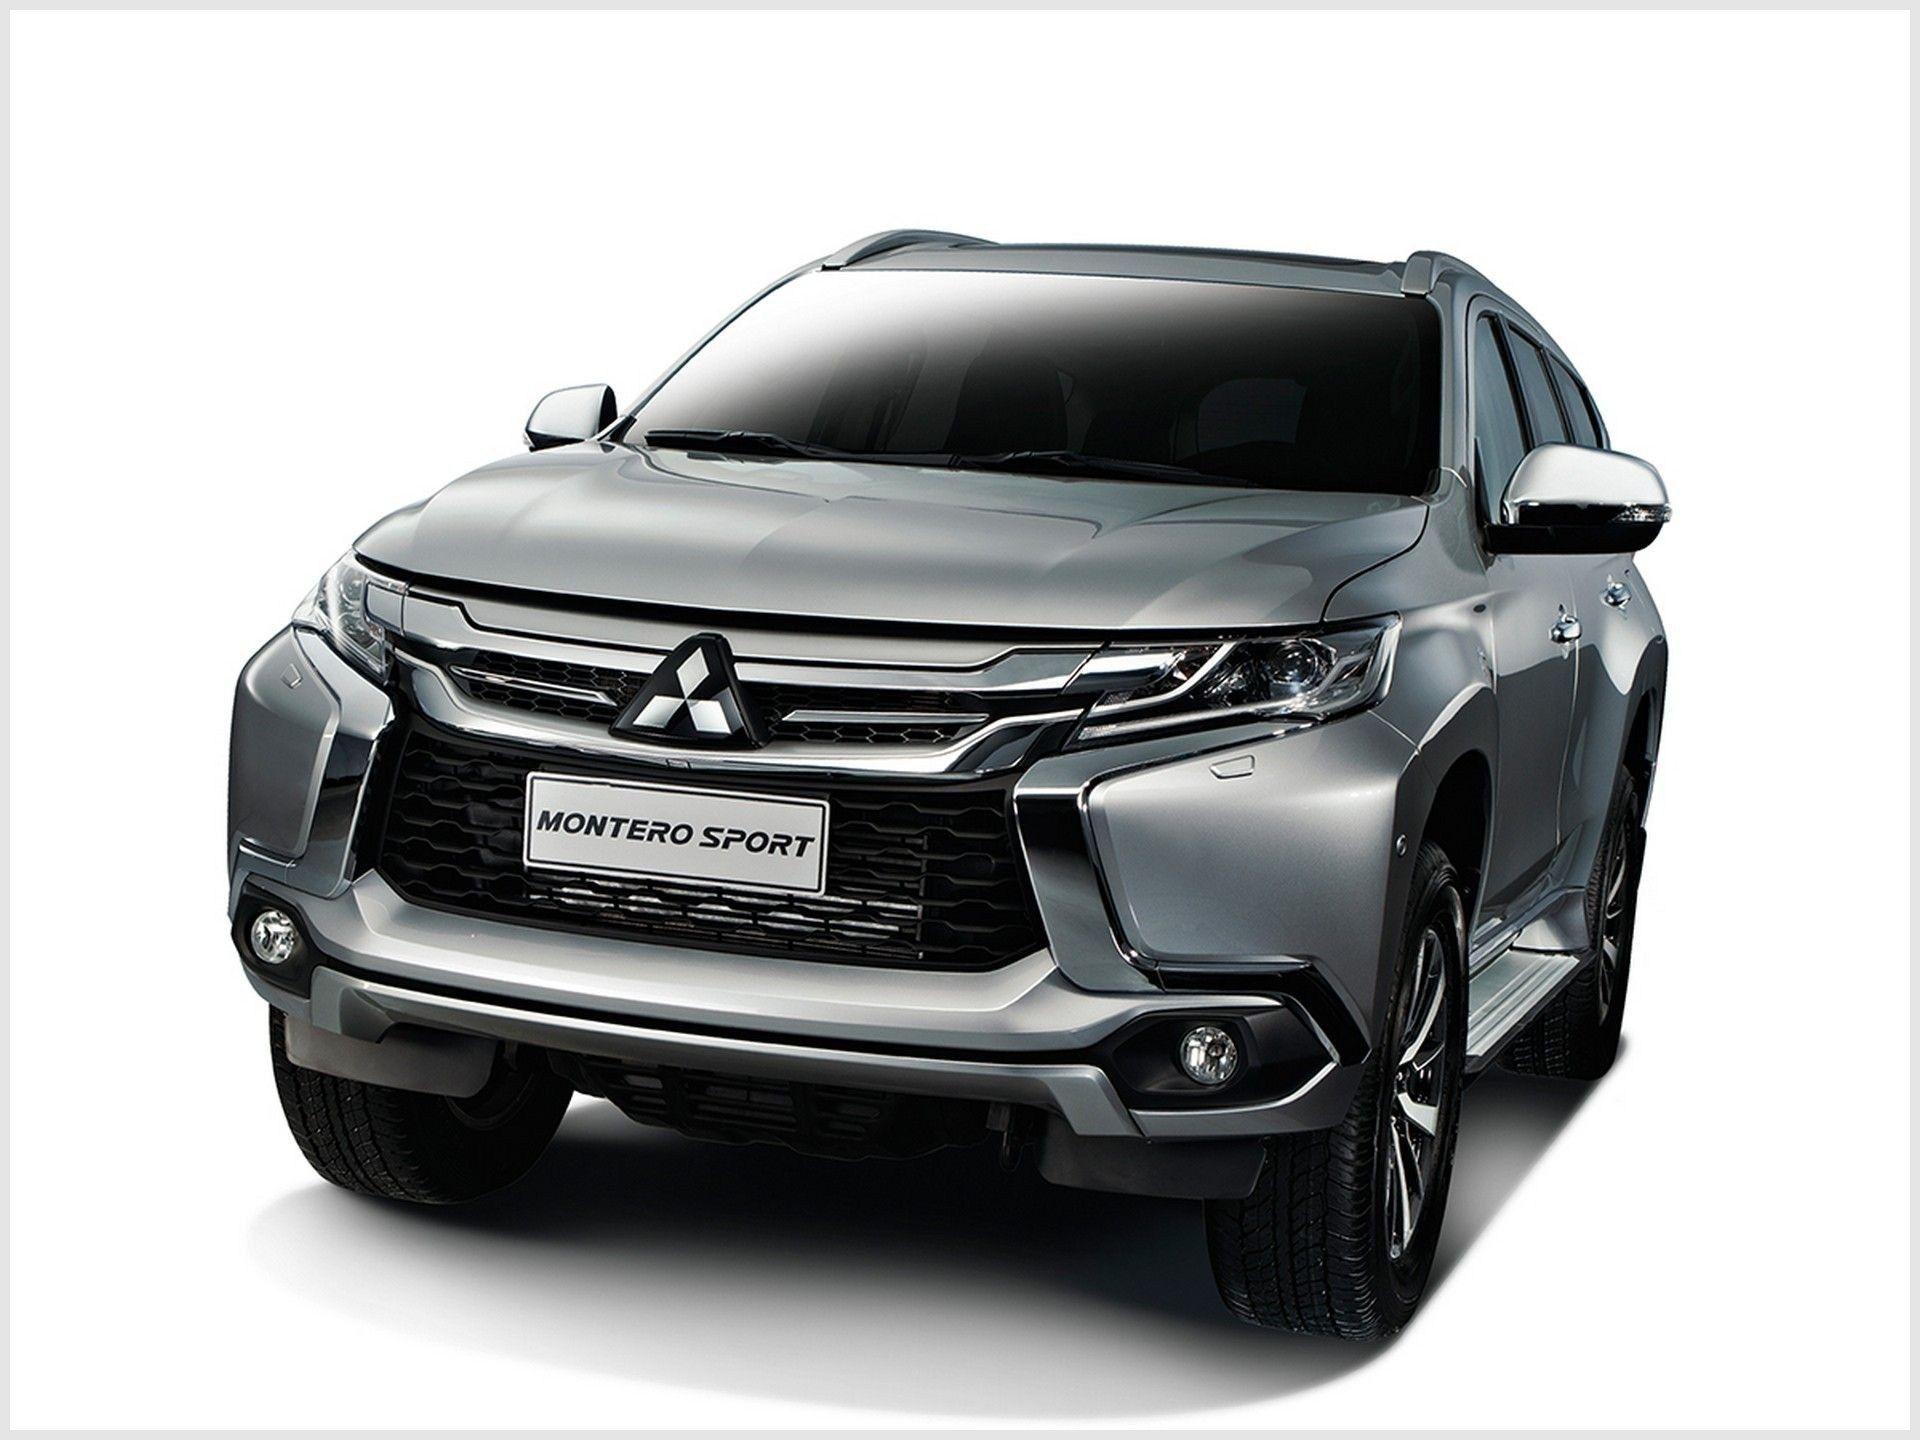 2020 Mitsubishi Montero Sport Philippines Mitsubishi